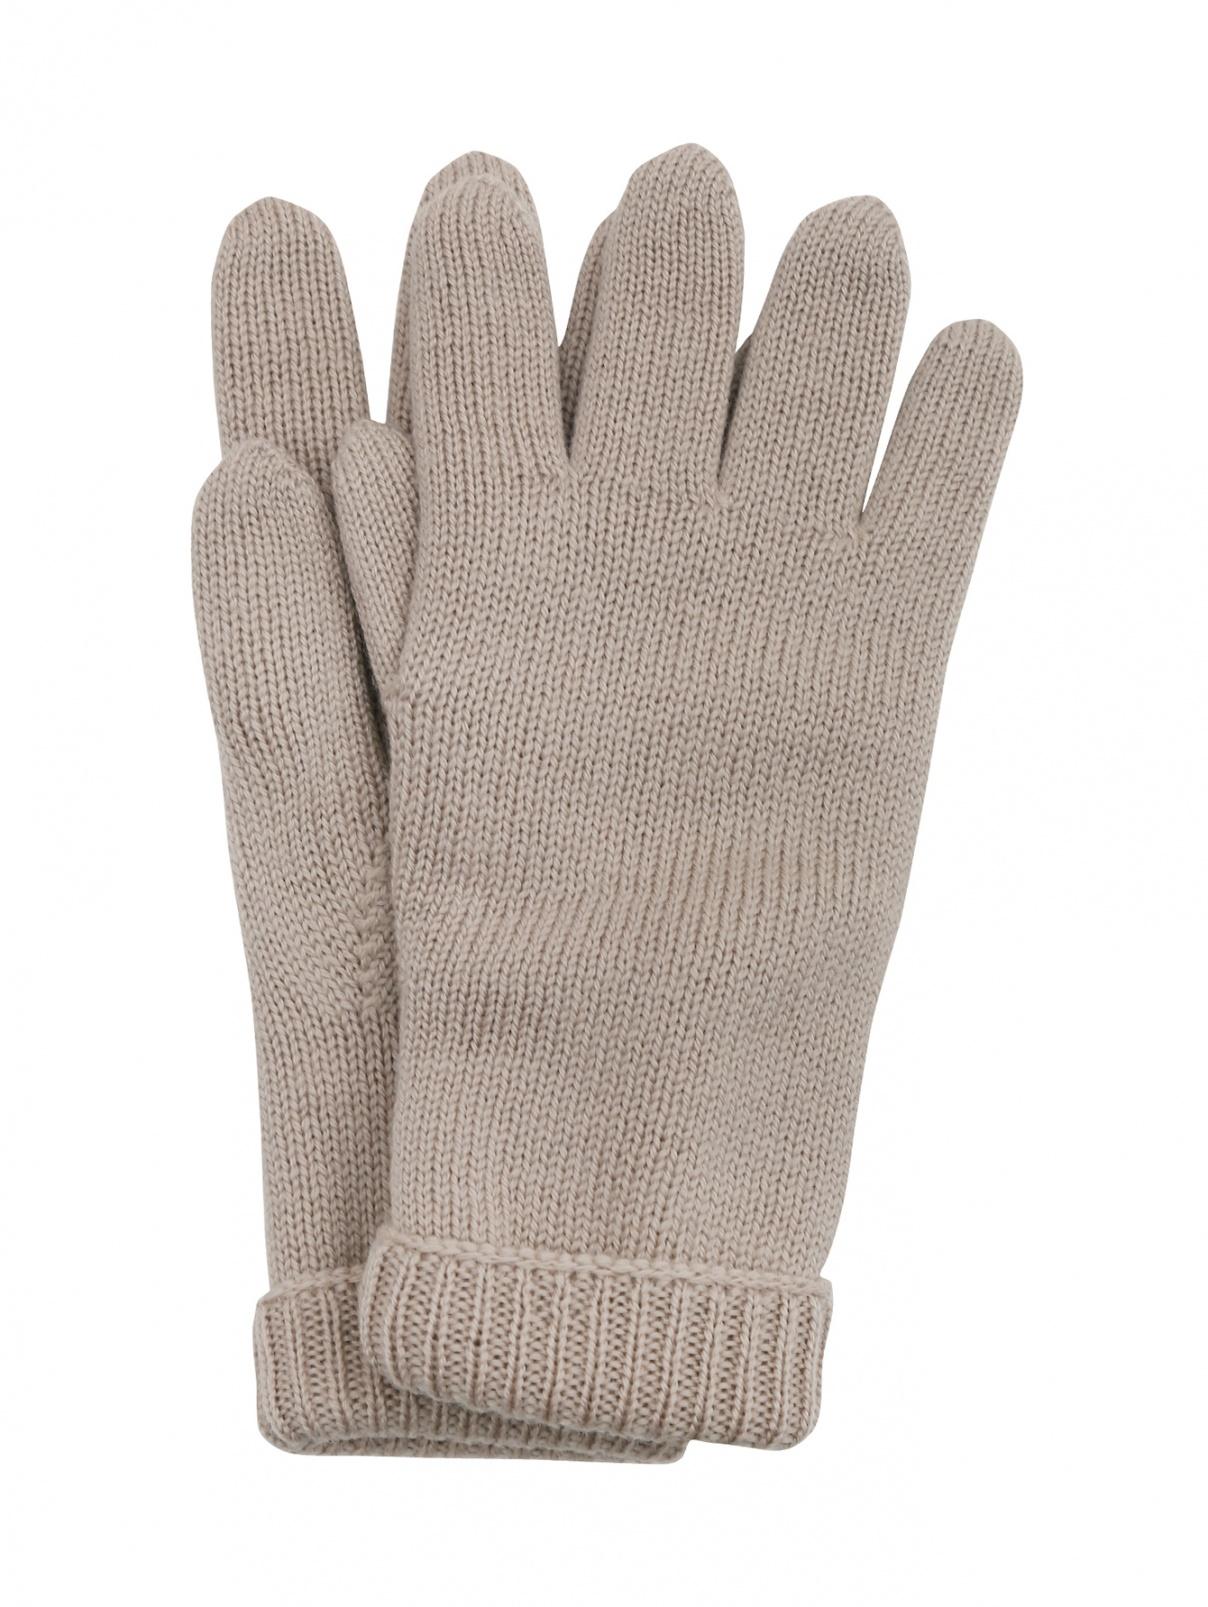 Однотонные перчатки из шерсти IL Trenino  –  Общий вид